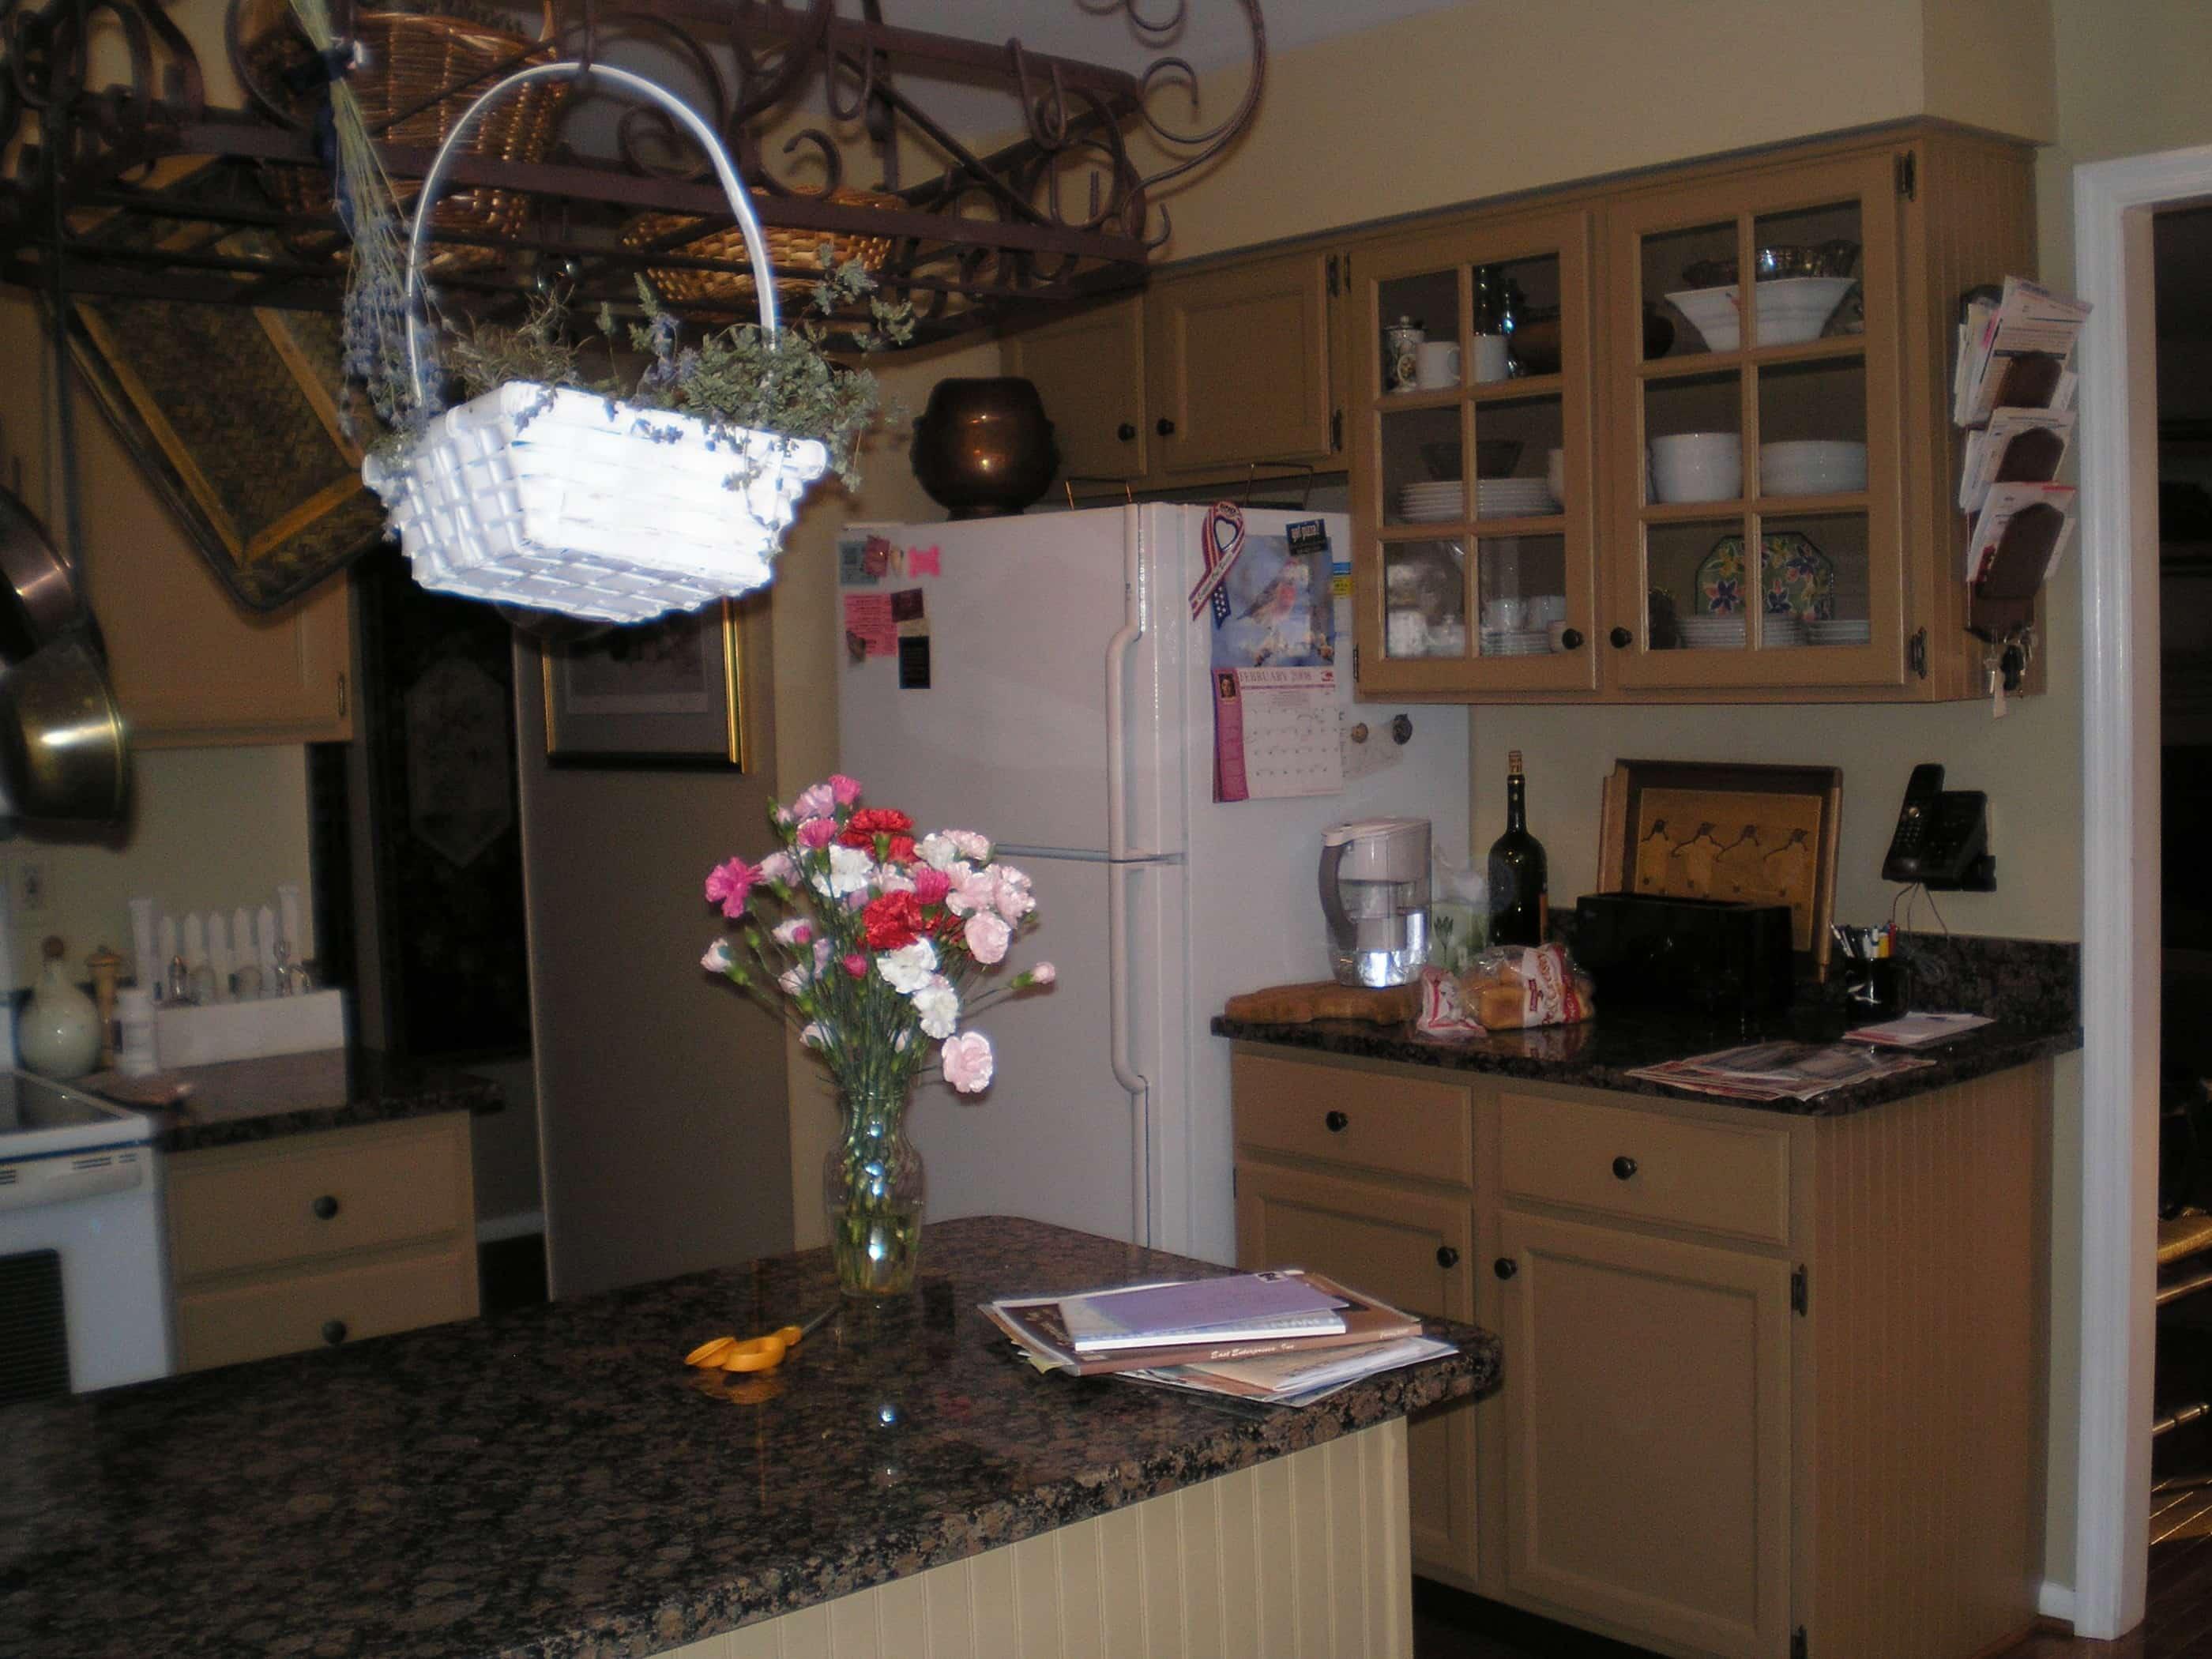 decluttering a cluttered kitchen